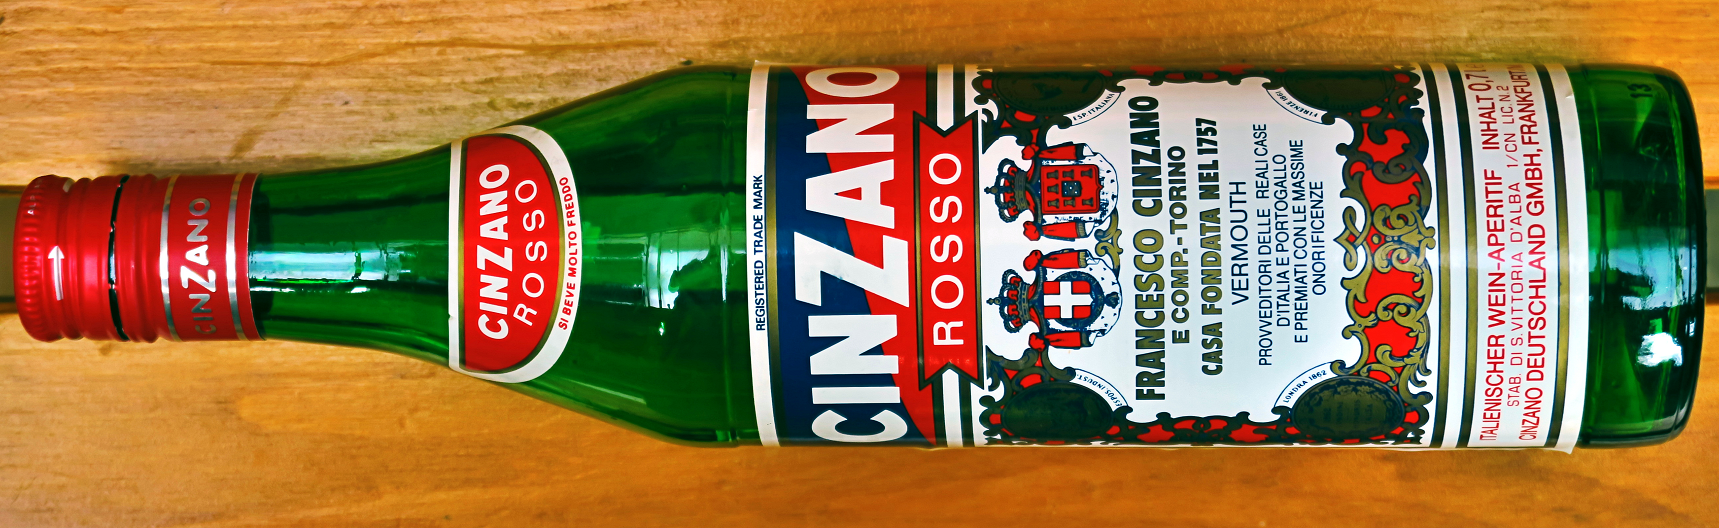 Cianzano - Bottle Cinzano Rosso